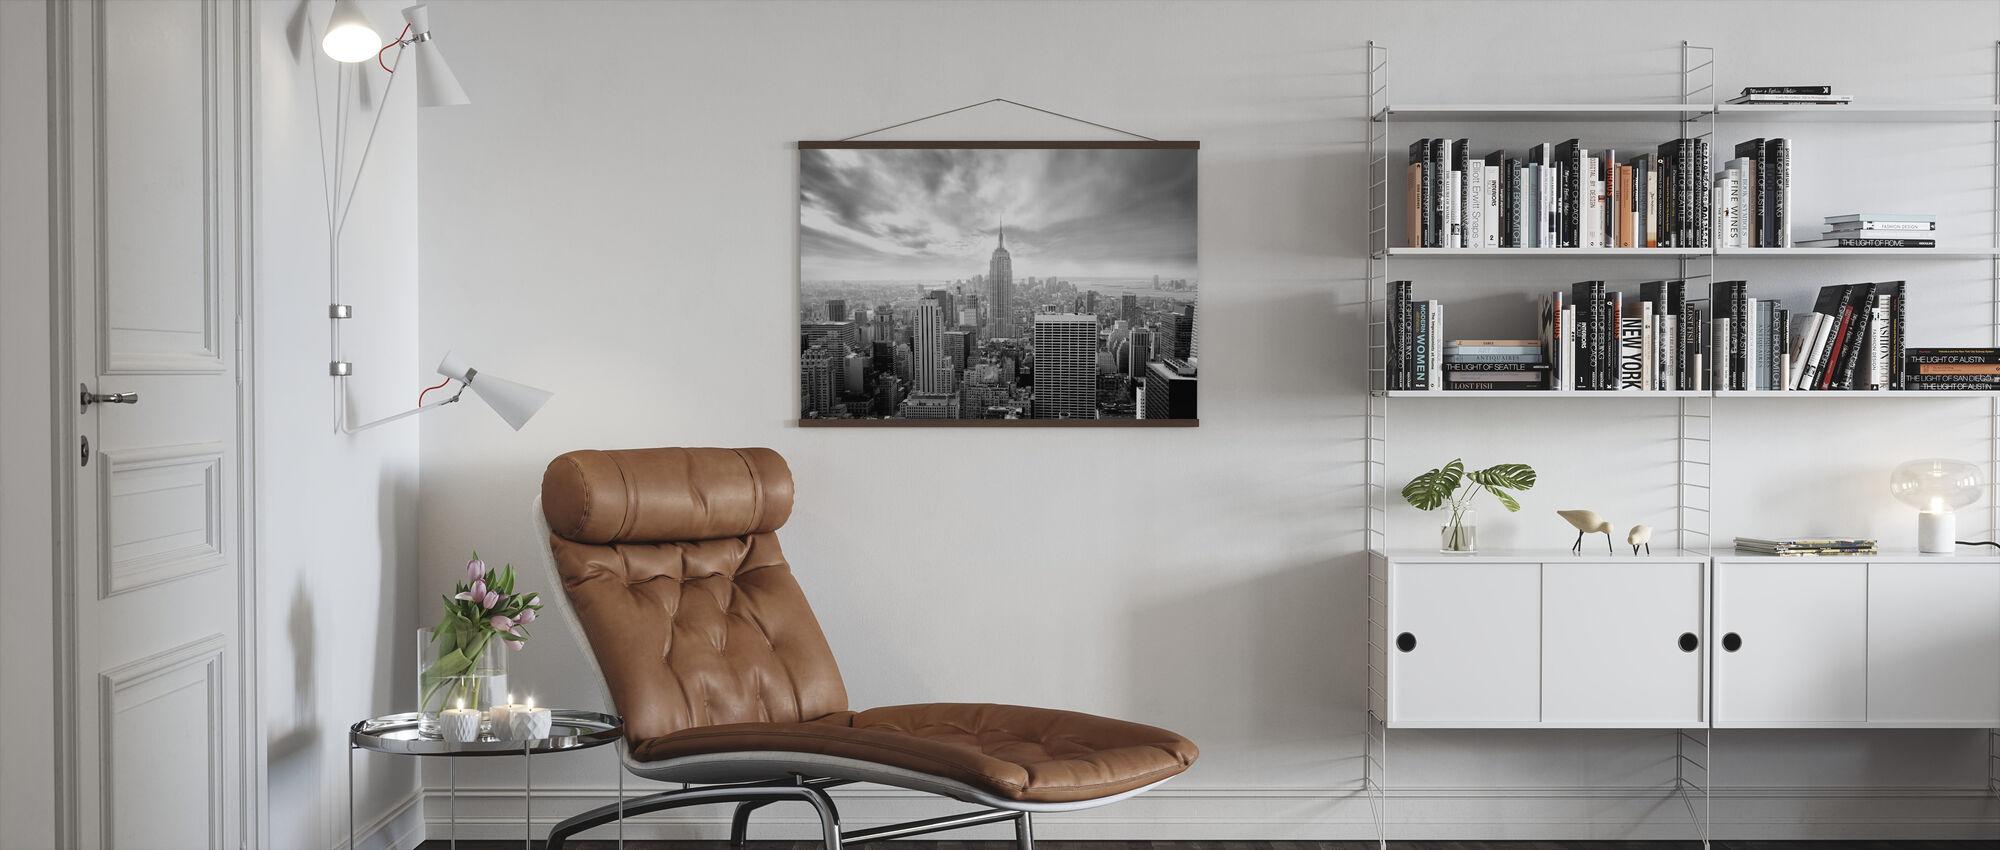 Enchanting New York - Poster - Living Room